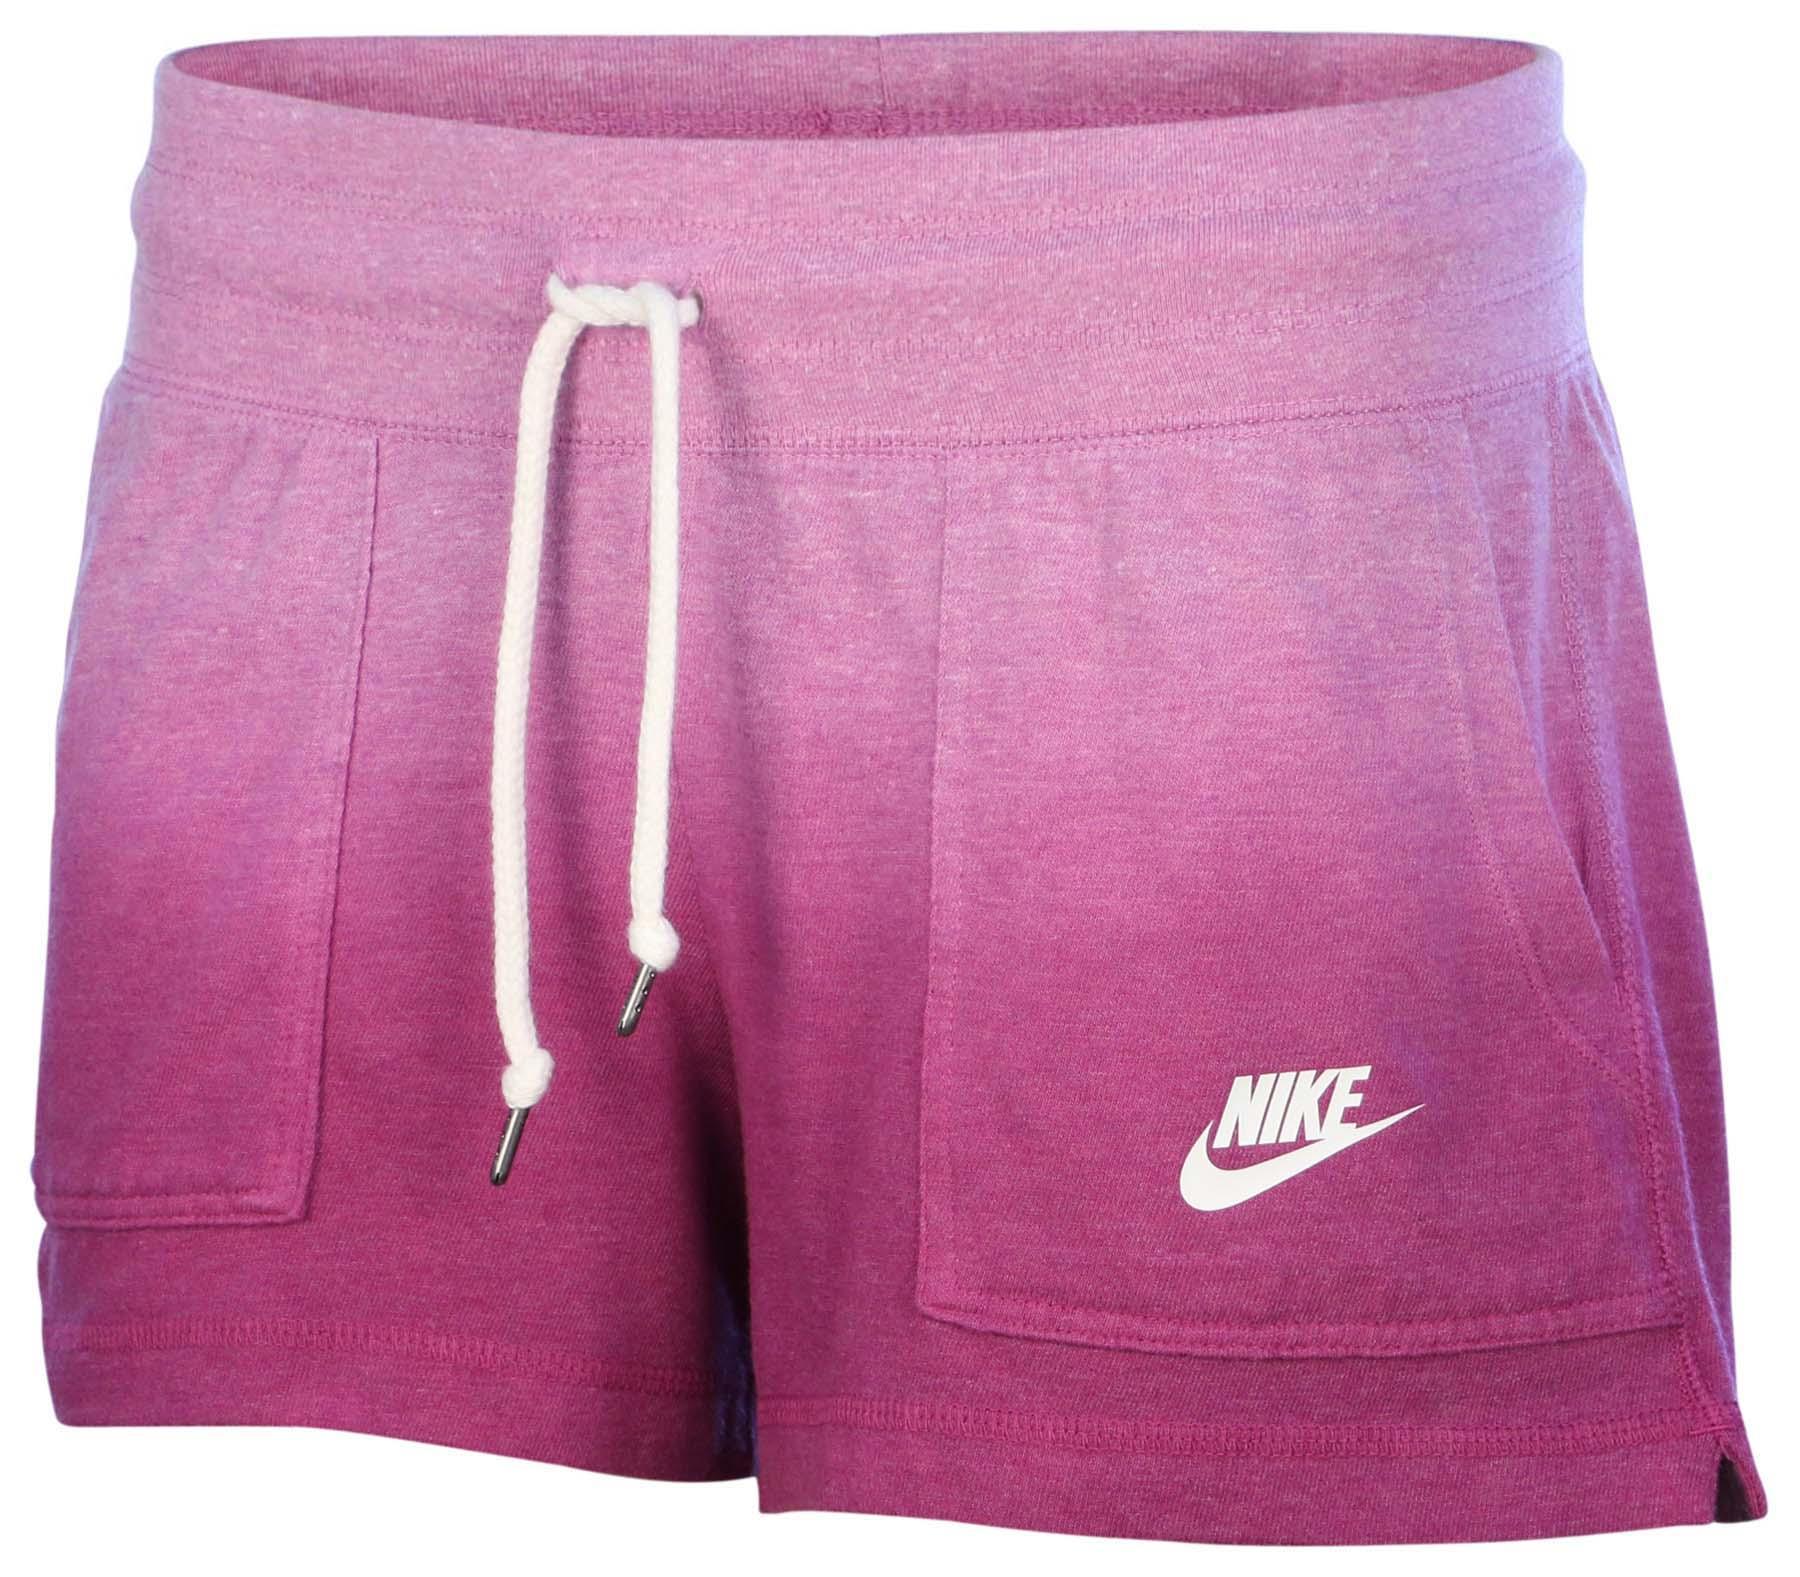 Nike Women's Gym Vintage Sport Casual Shorts | eBay